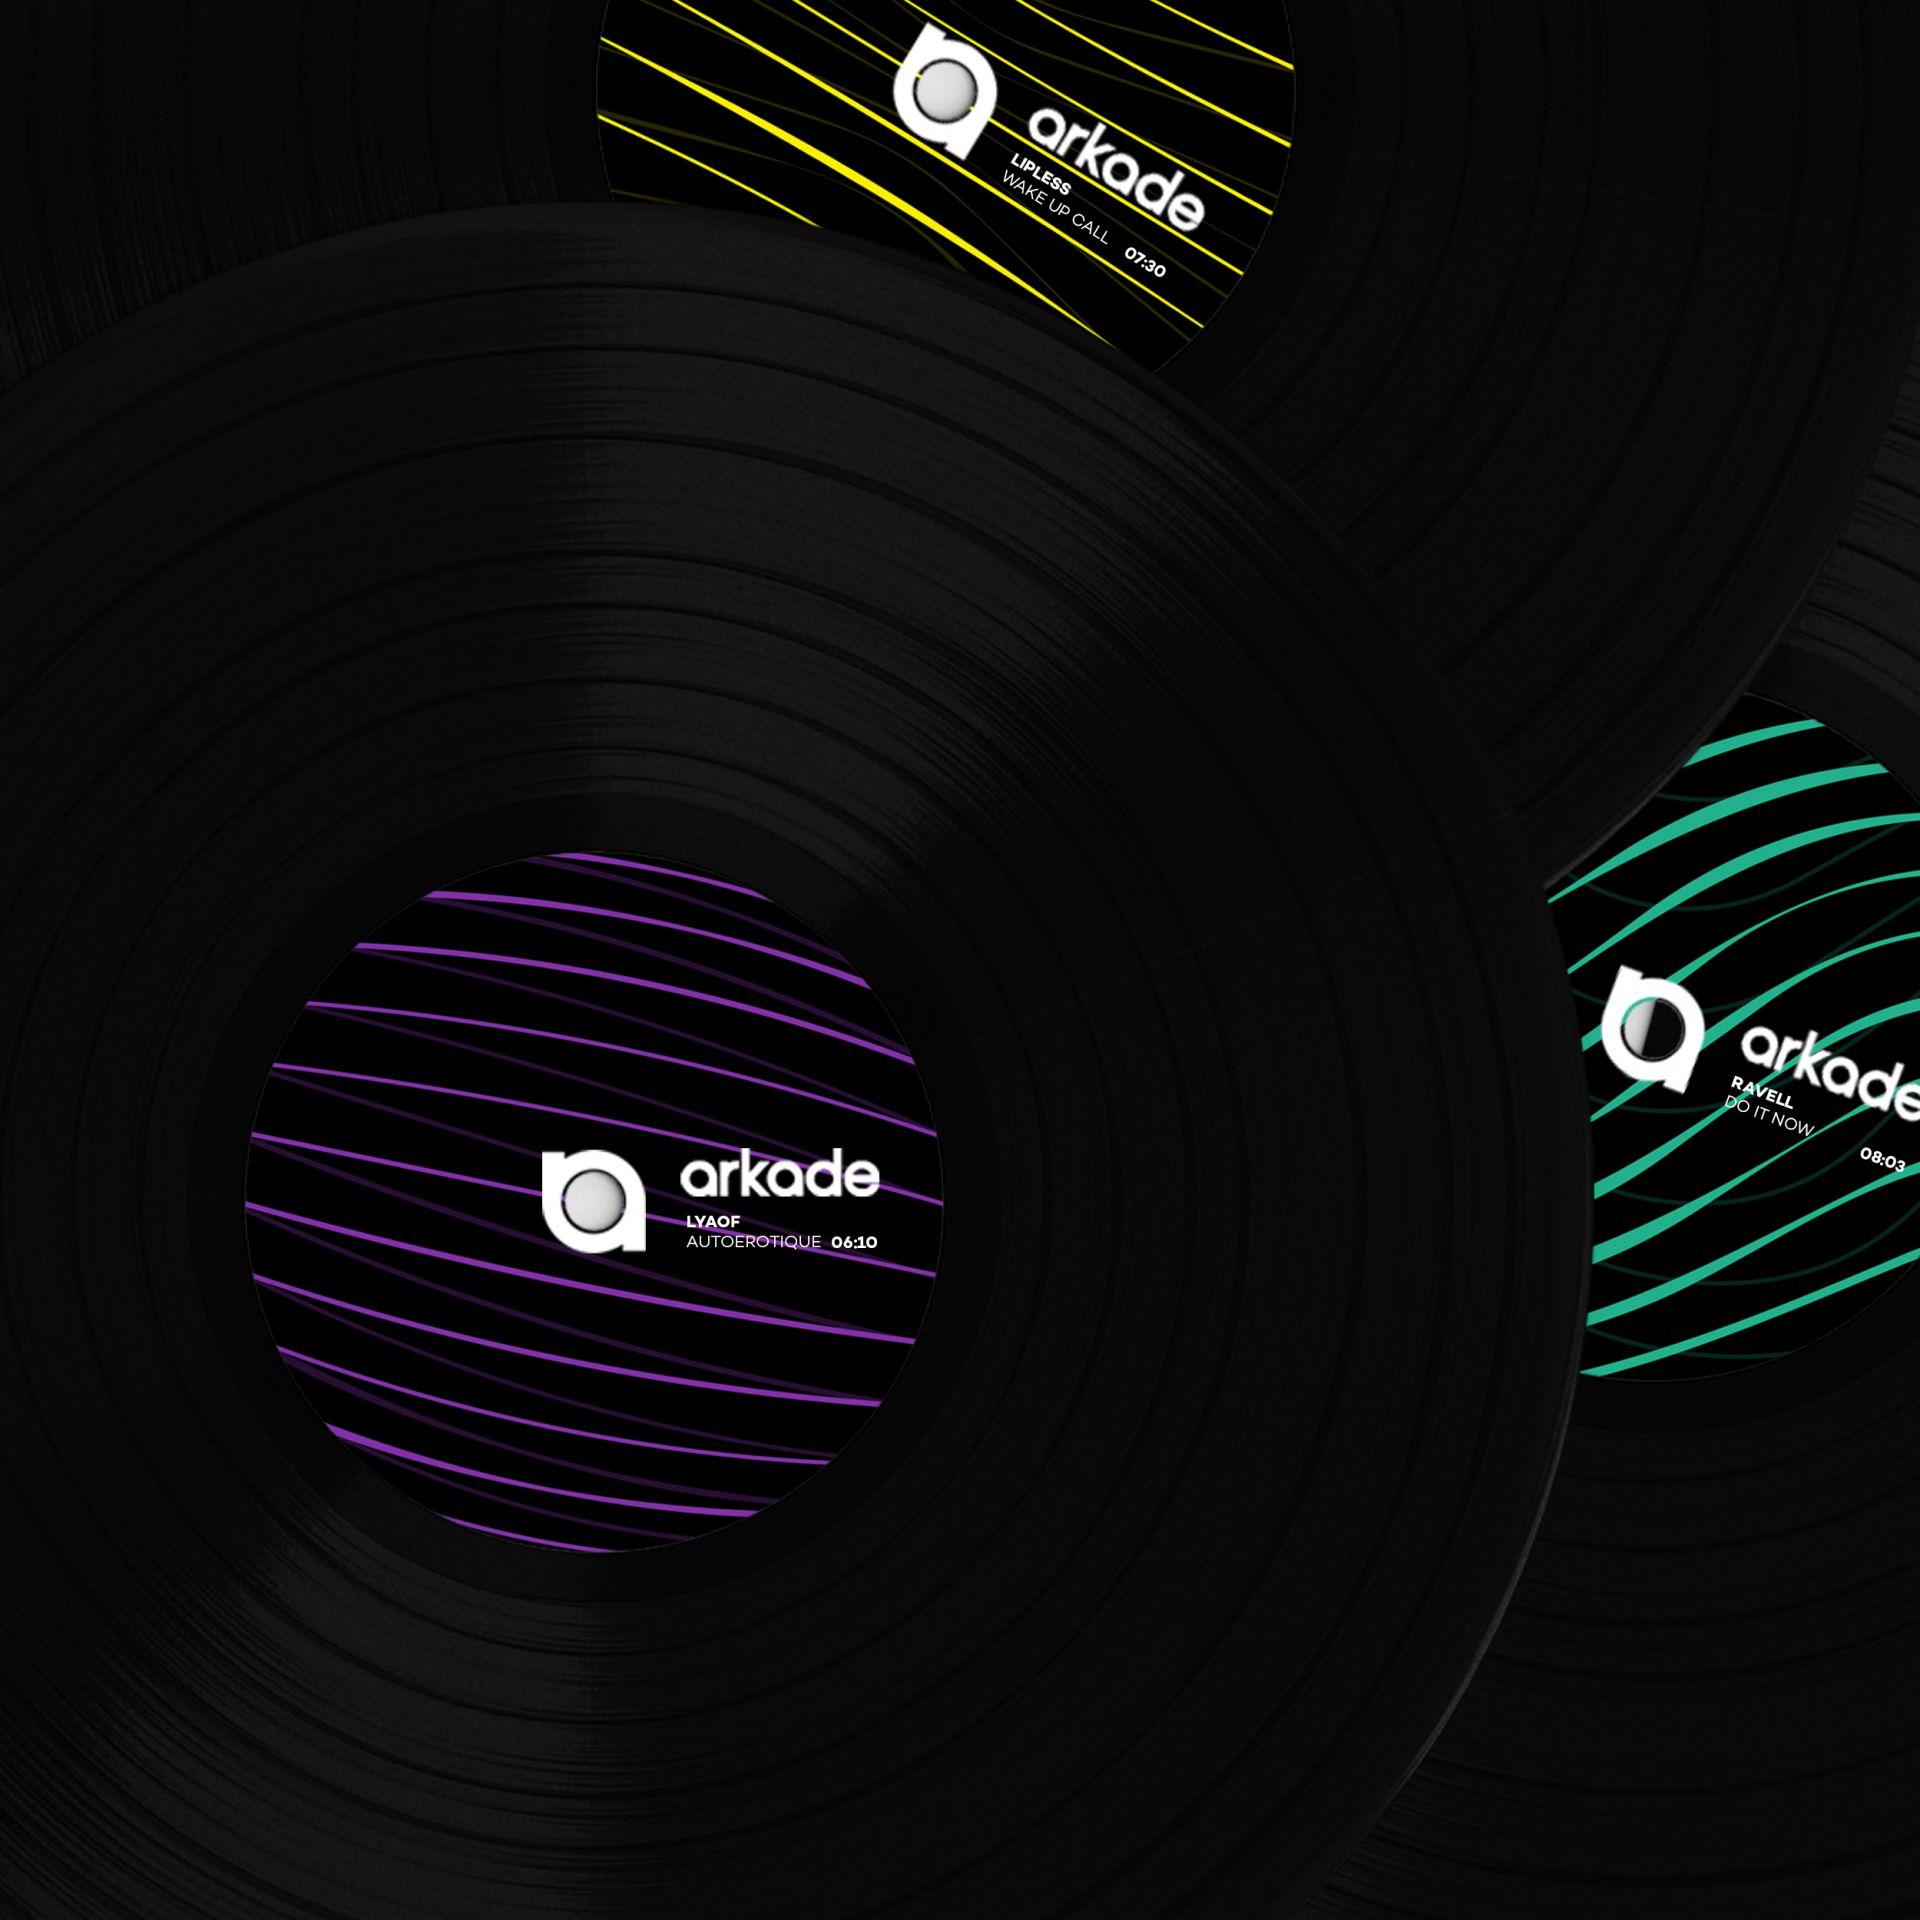 Arkade - The Vinyl Collection - Vinyl packaging design